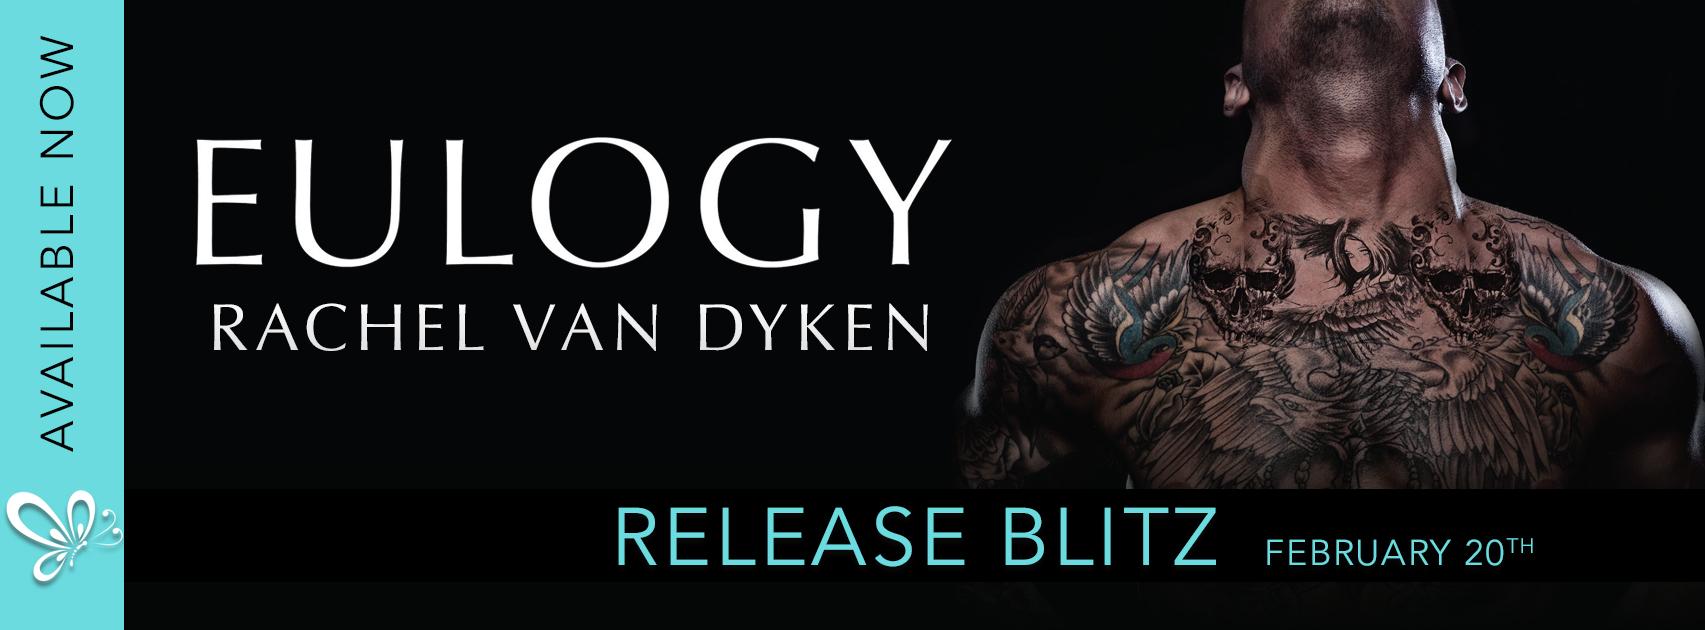 Release Day Blitz: Eulogy by Rachel Van Dyken @RachVD @jennw23